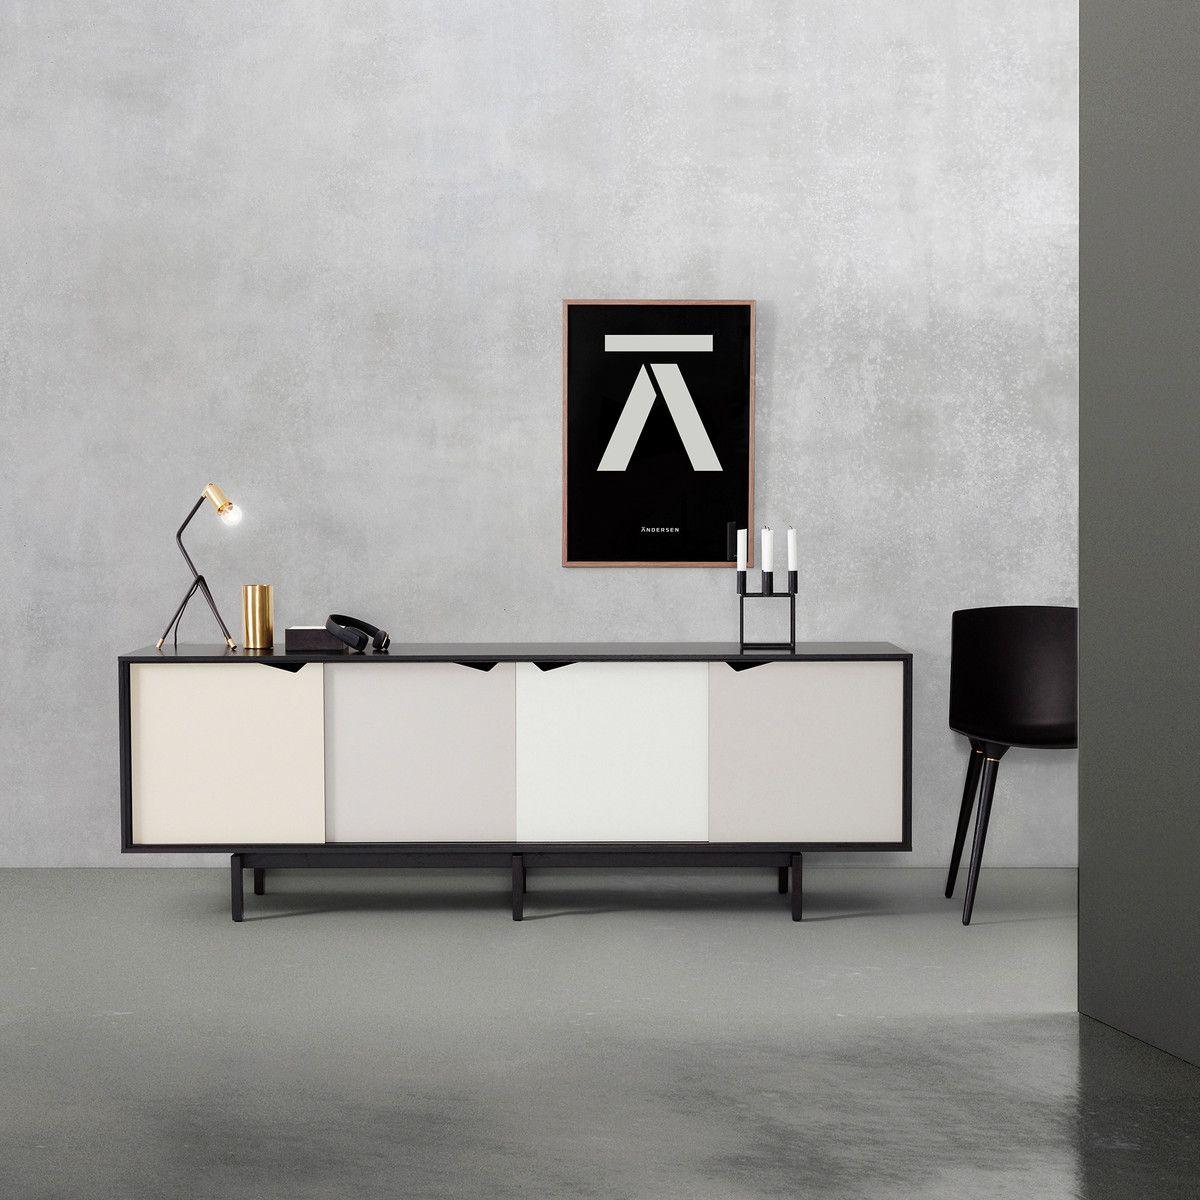 Andersen Furniture - S1 Sideboard, Eiche geseift/ Türen Dali ...